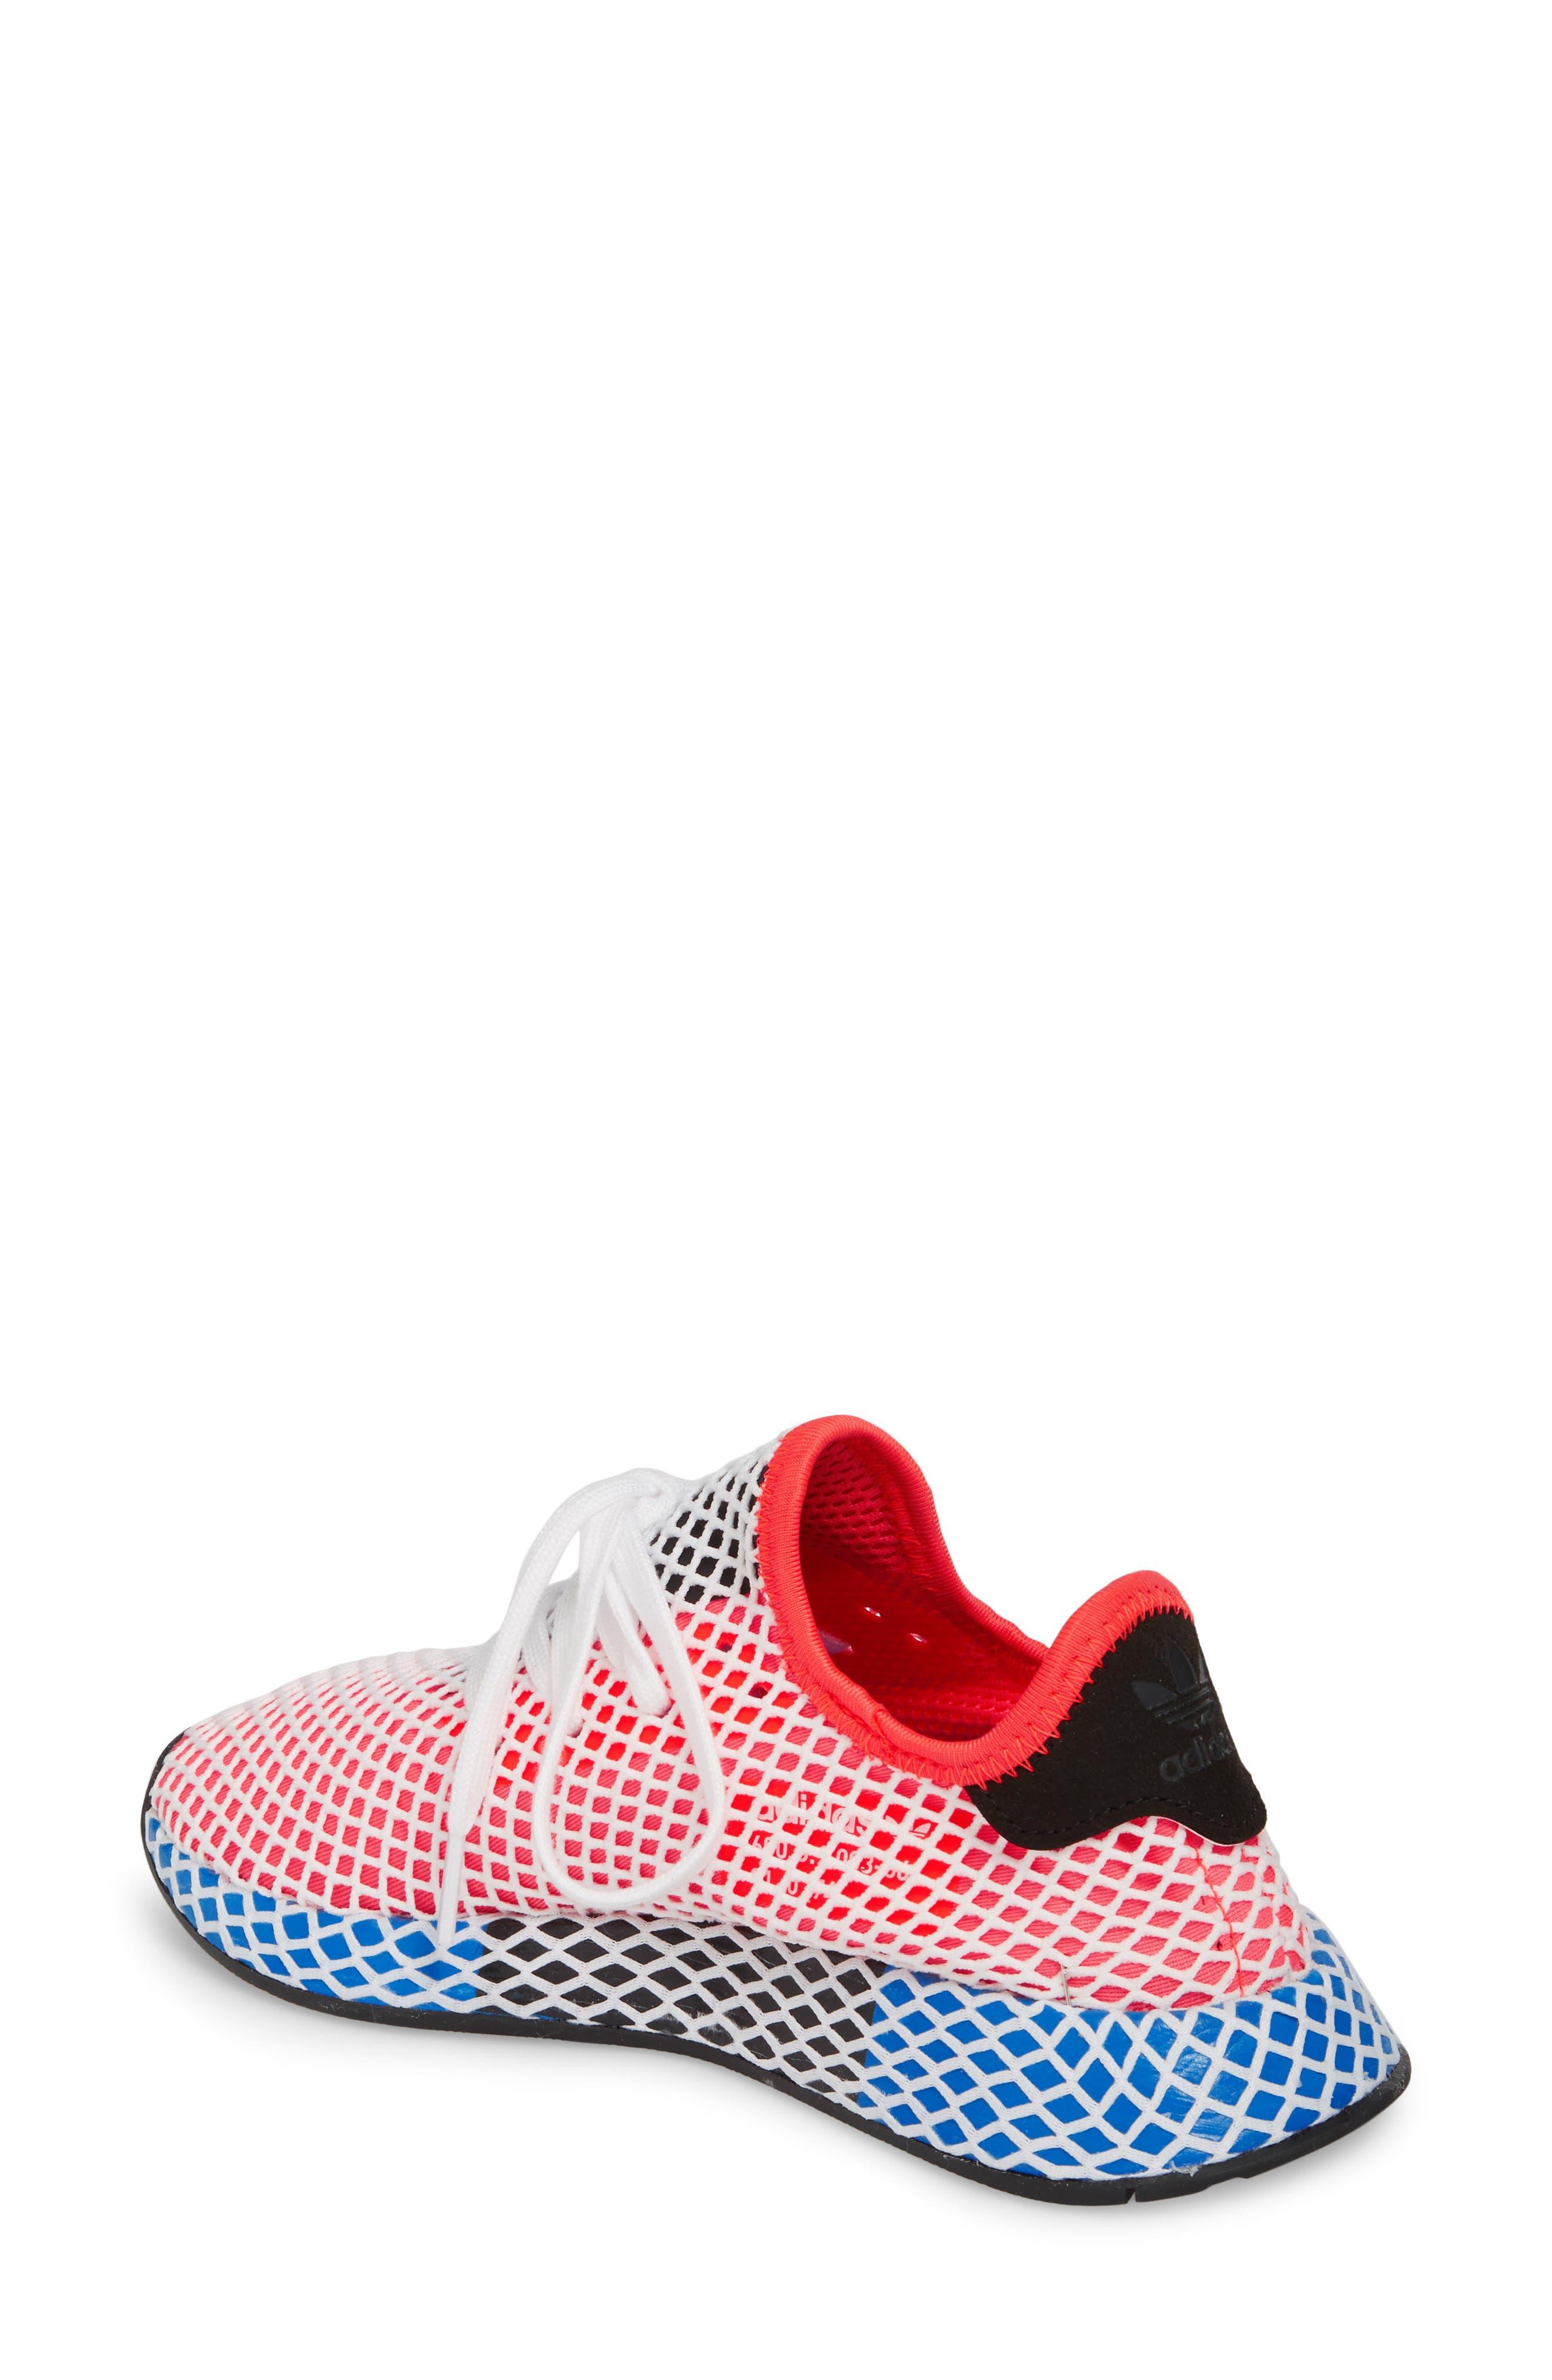 Deerupt Runner Sneaker,                             Alternate thumbnail 2, color,                             600